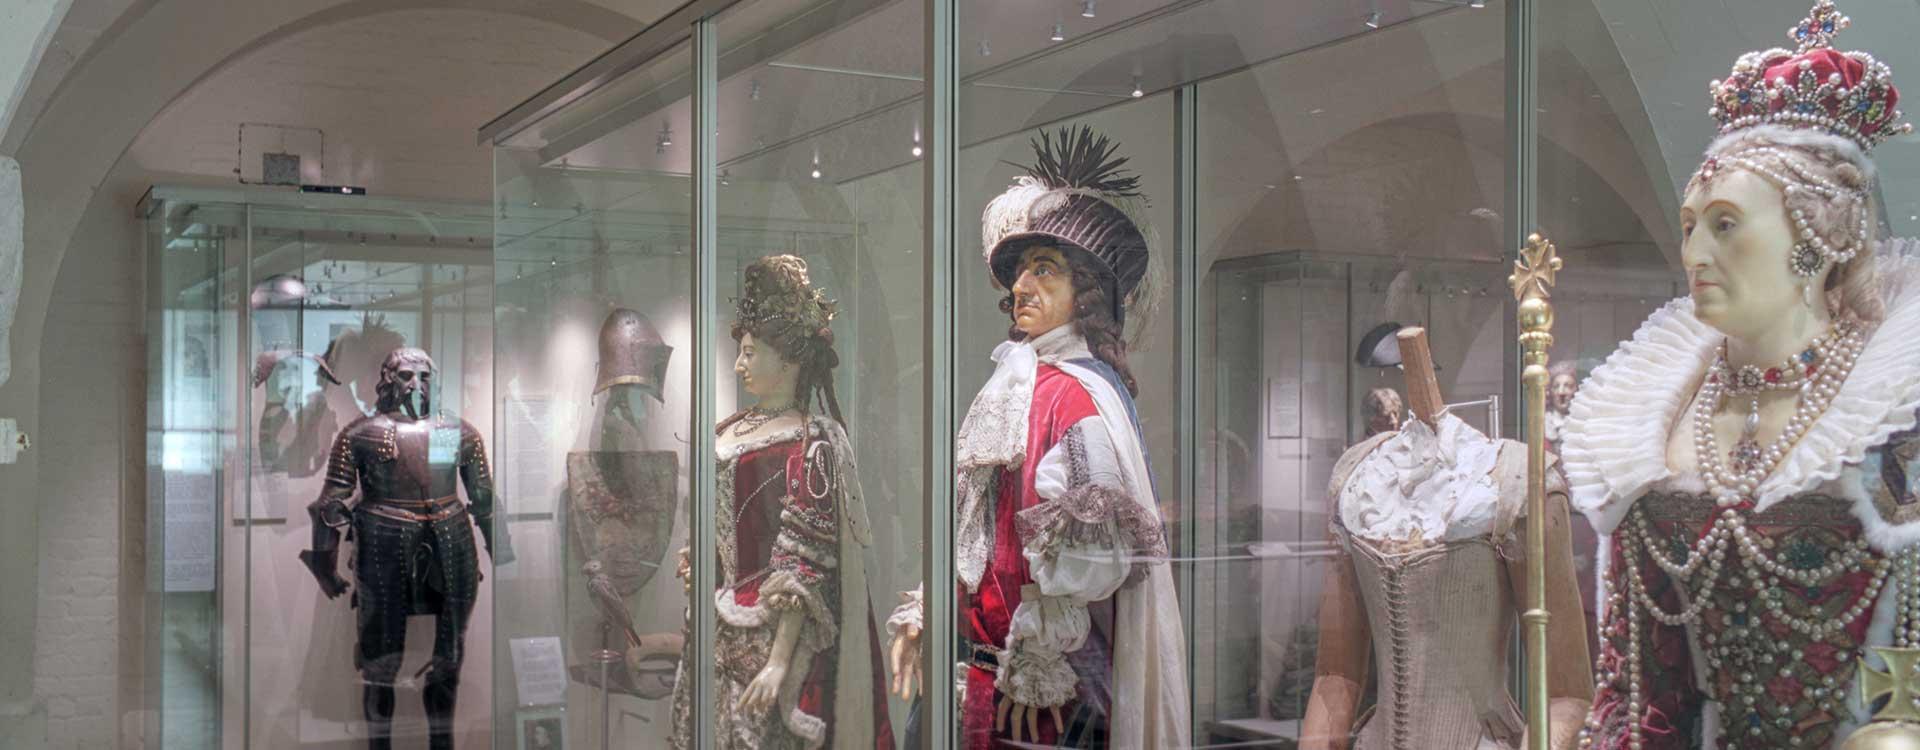 Fiber Optics In Westminster Abbey Museum